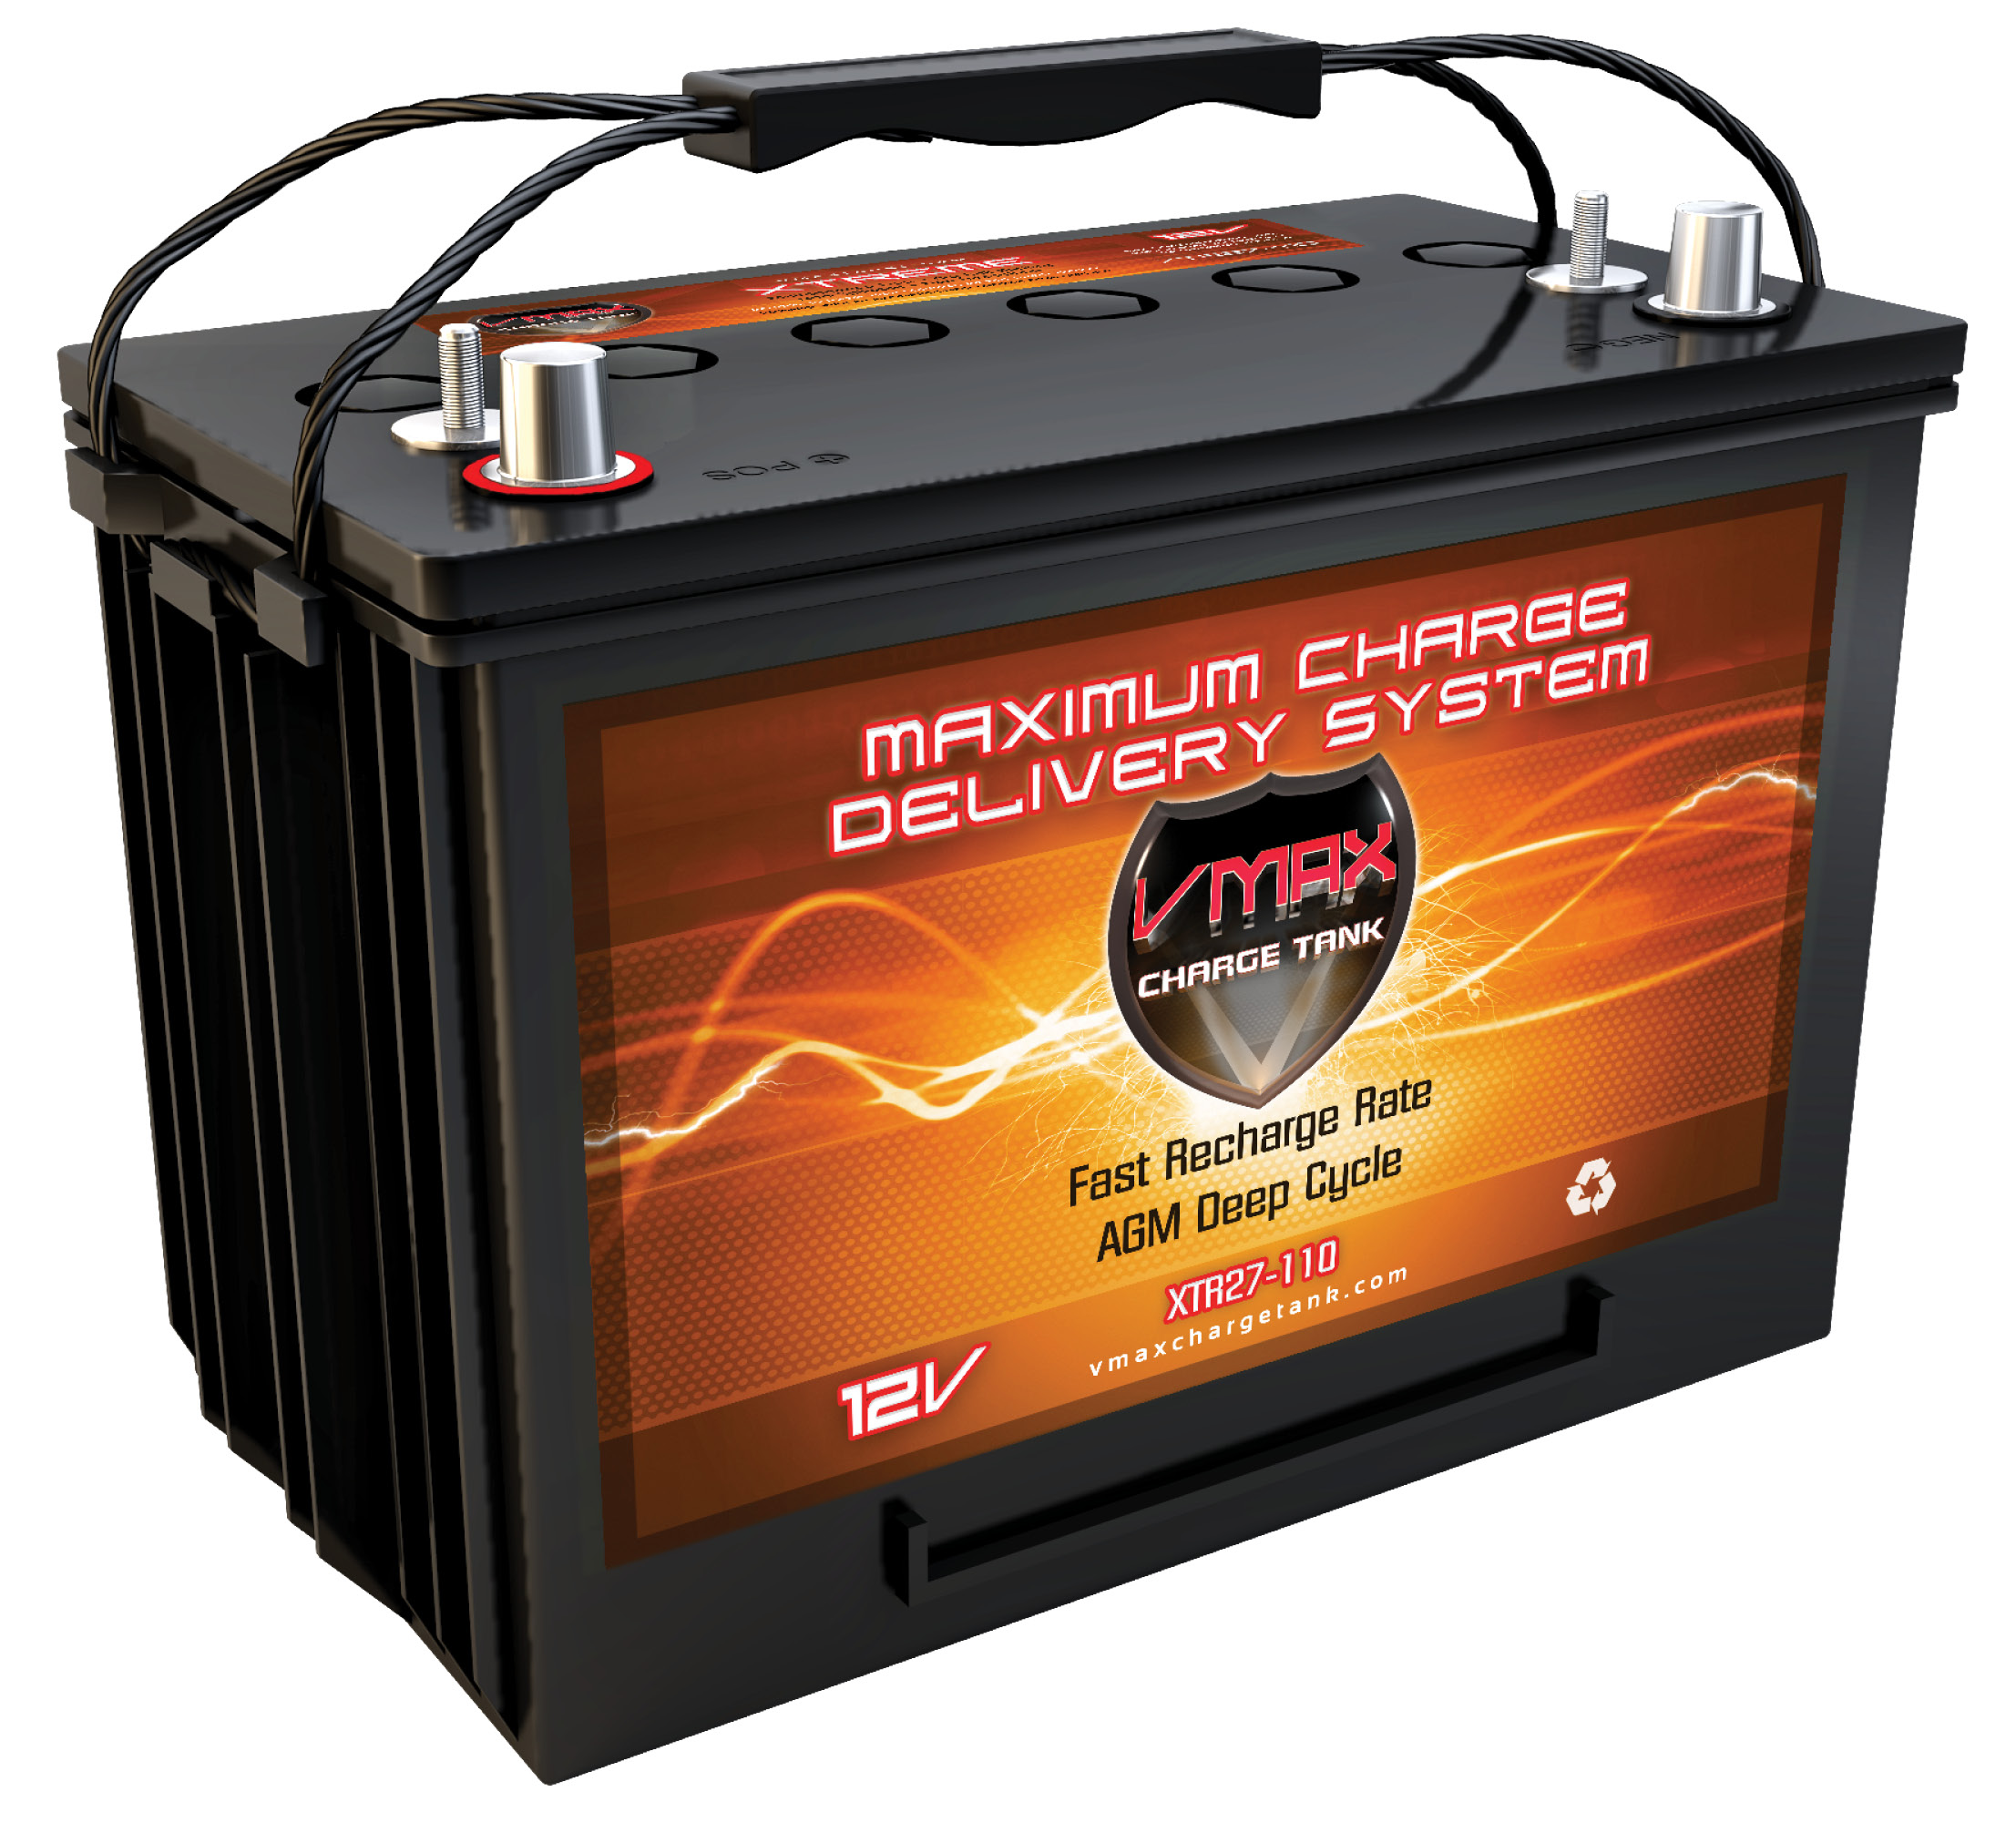 VMAX XTR27-110 Heavy Duty Battery replaces Power Volt V27...